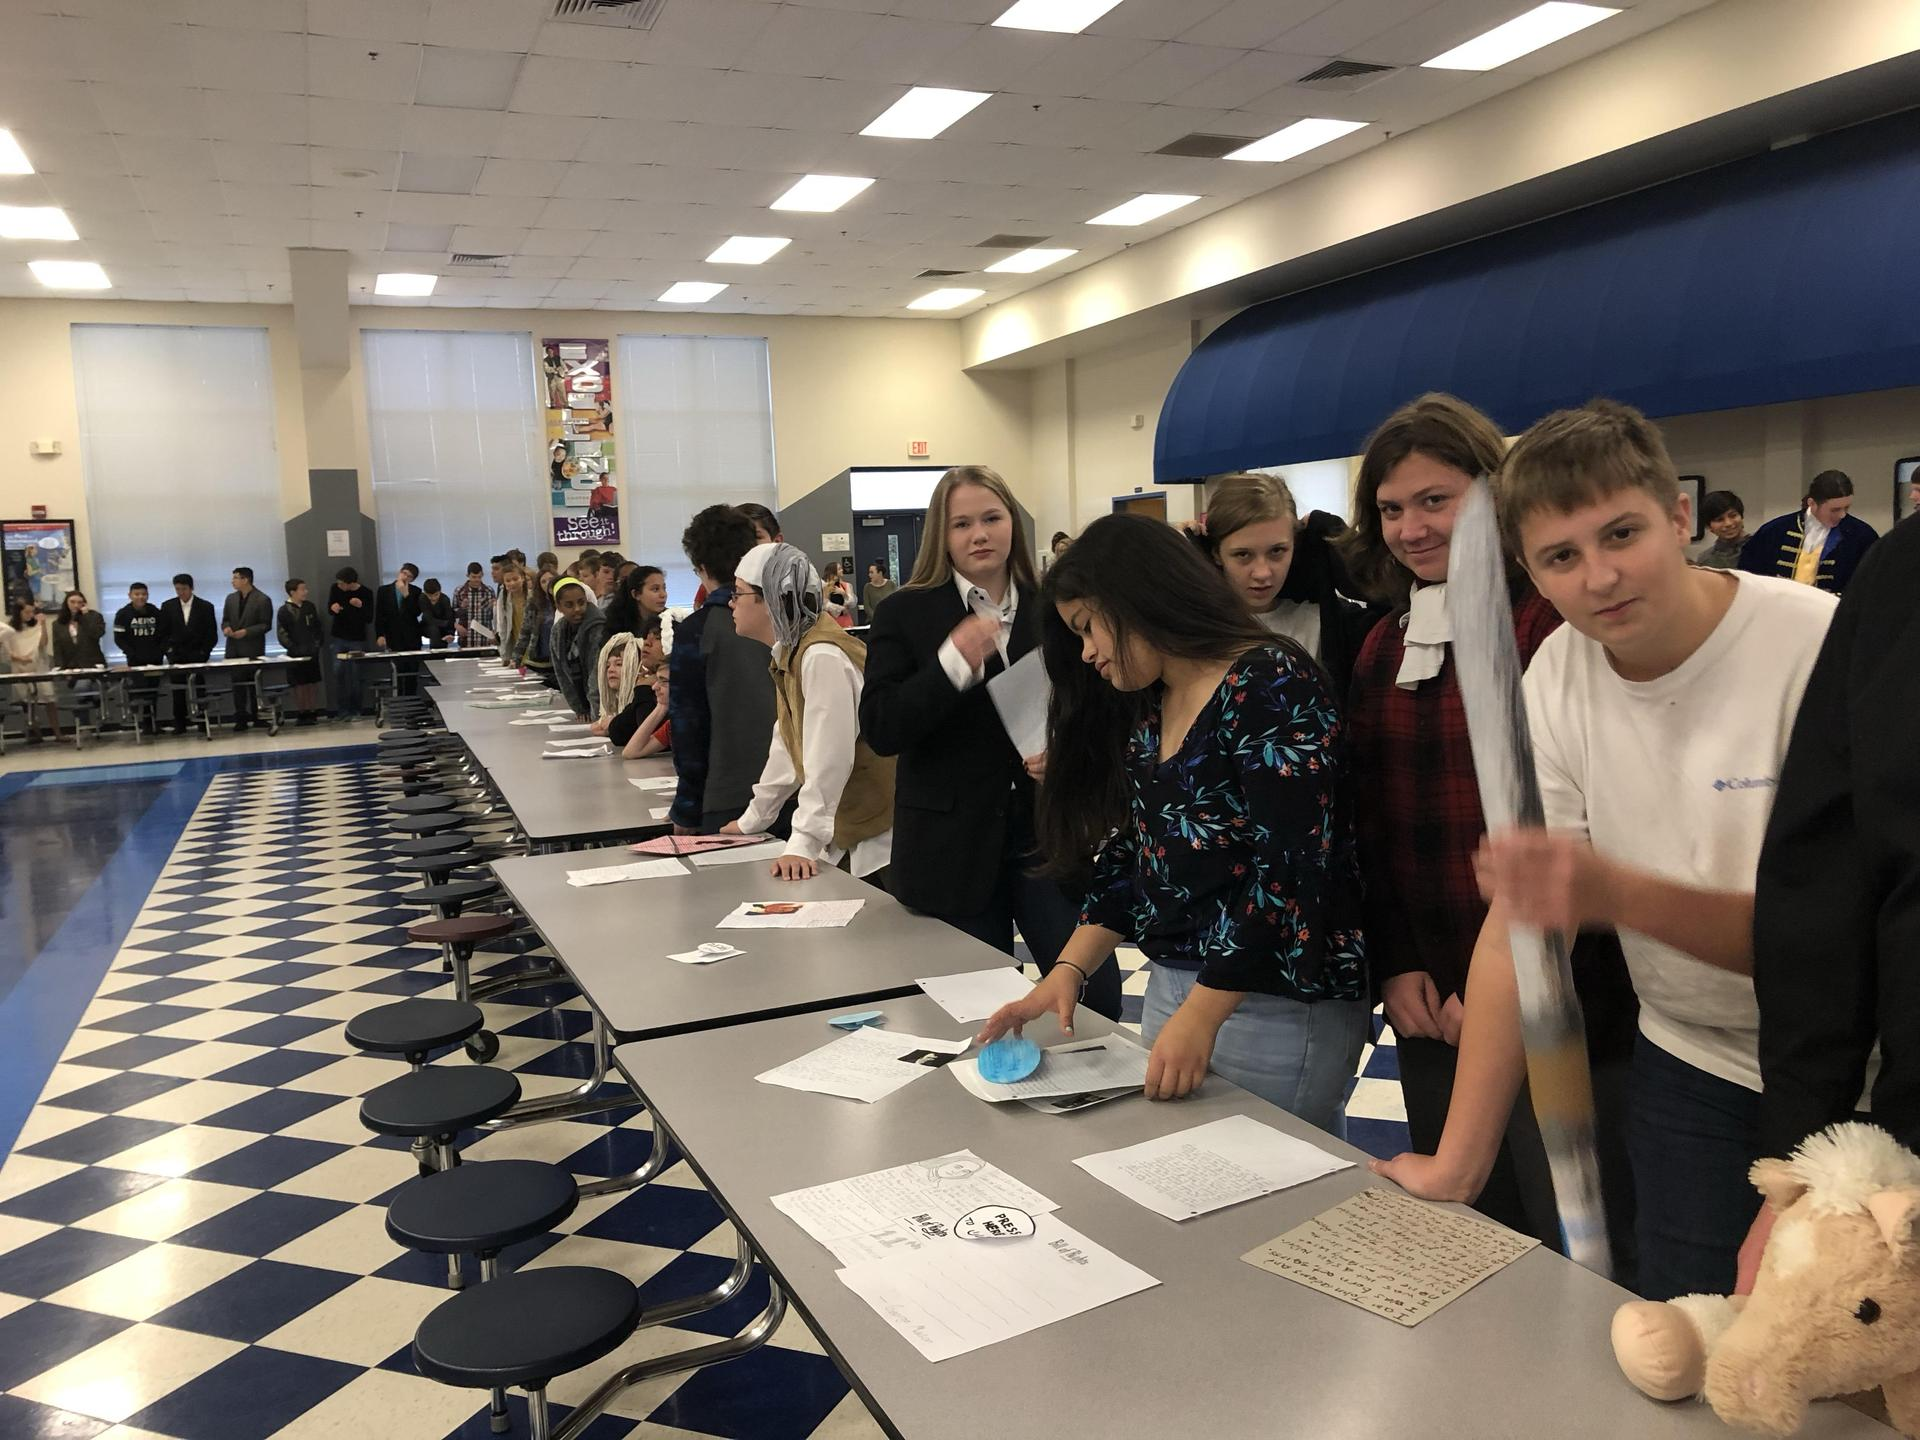 8th grade wax museum